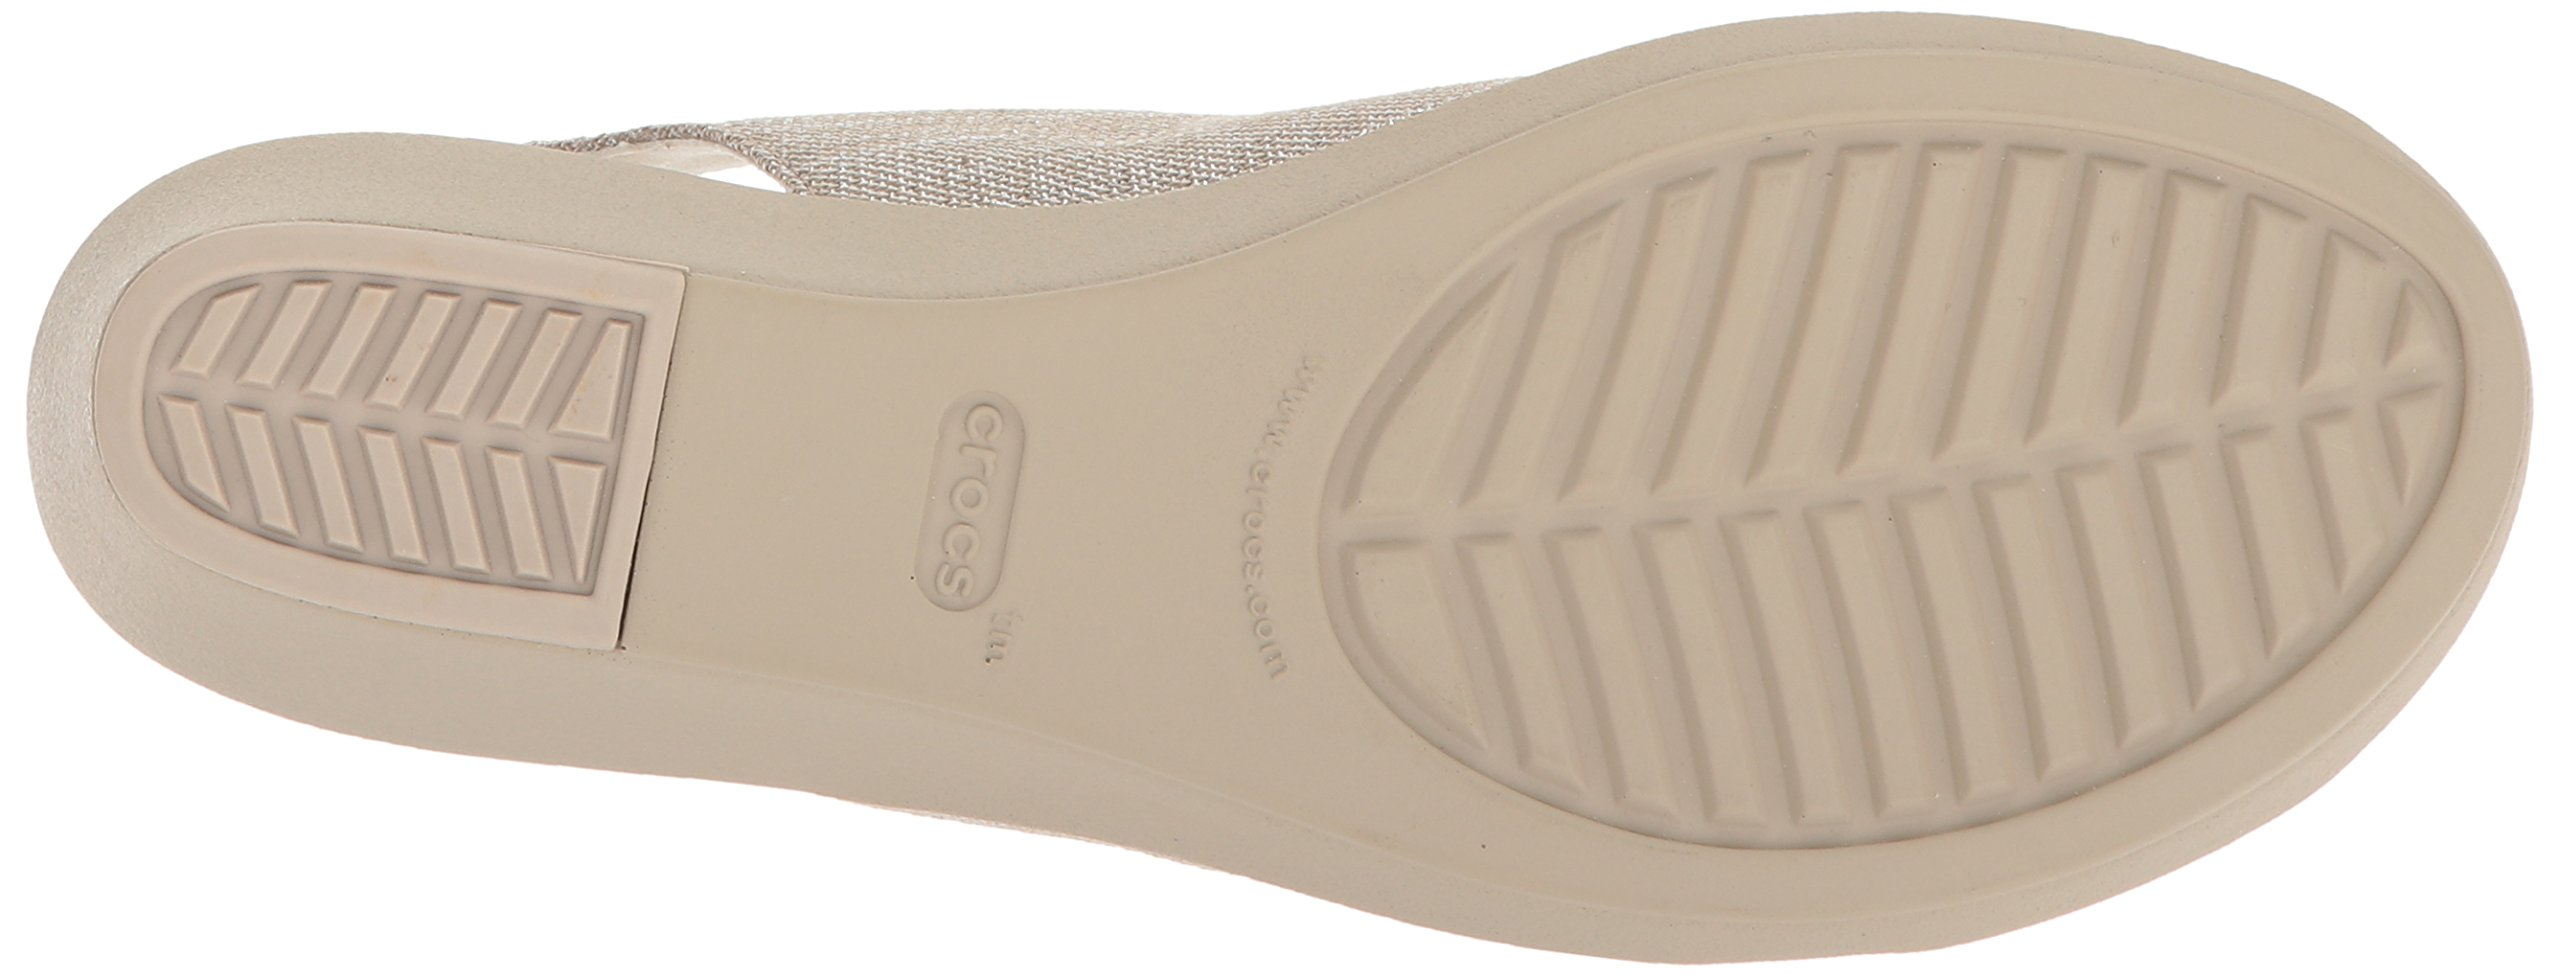 0e71f973728d Crocs Women s Leigh Ann Shimer Slngbck WDG W Wedge Sandal